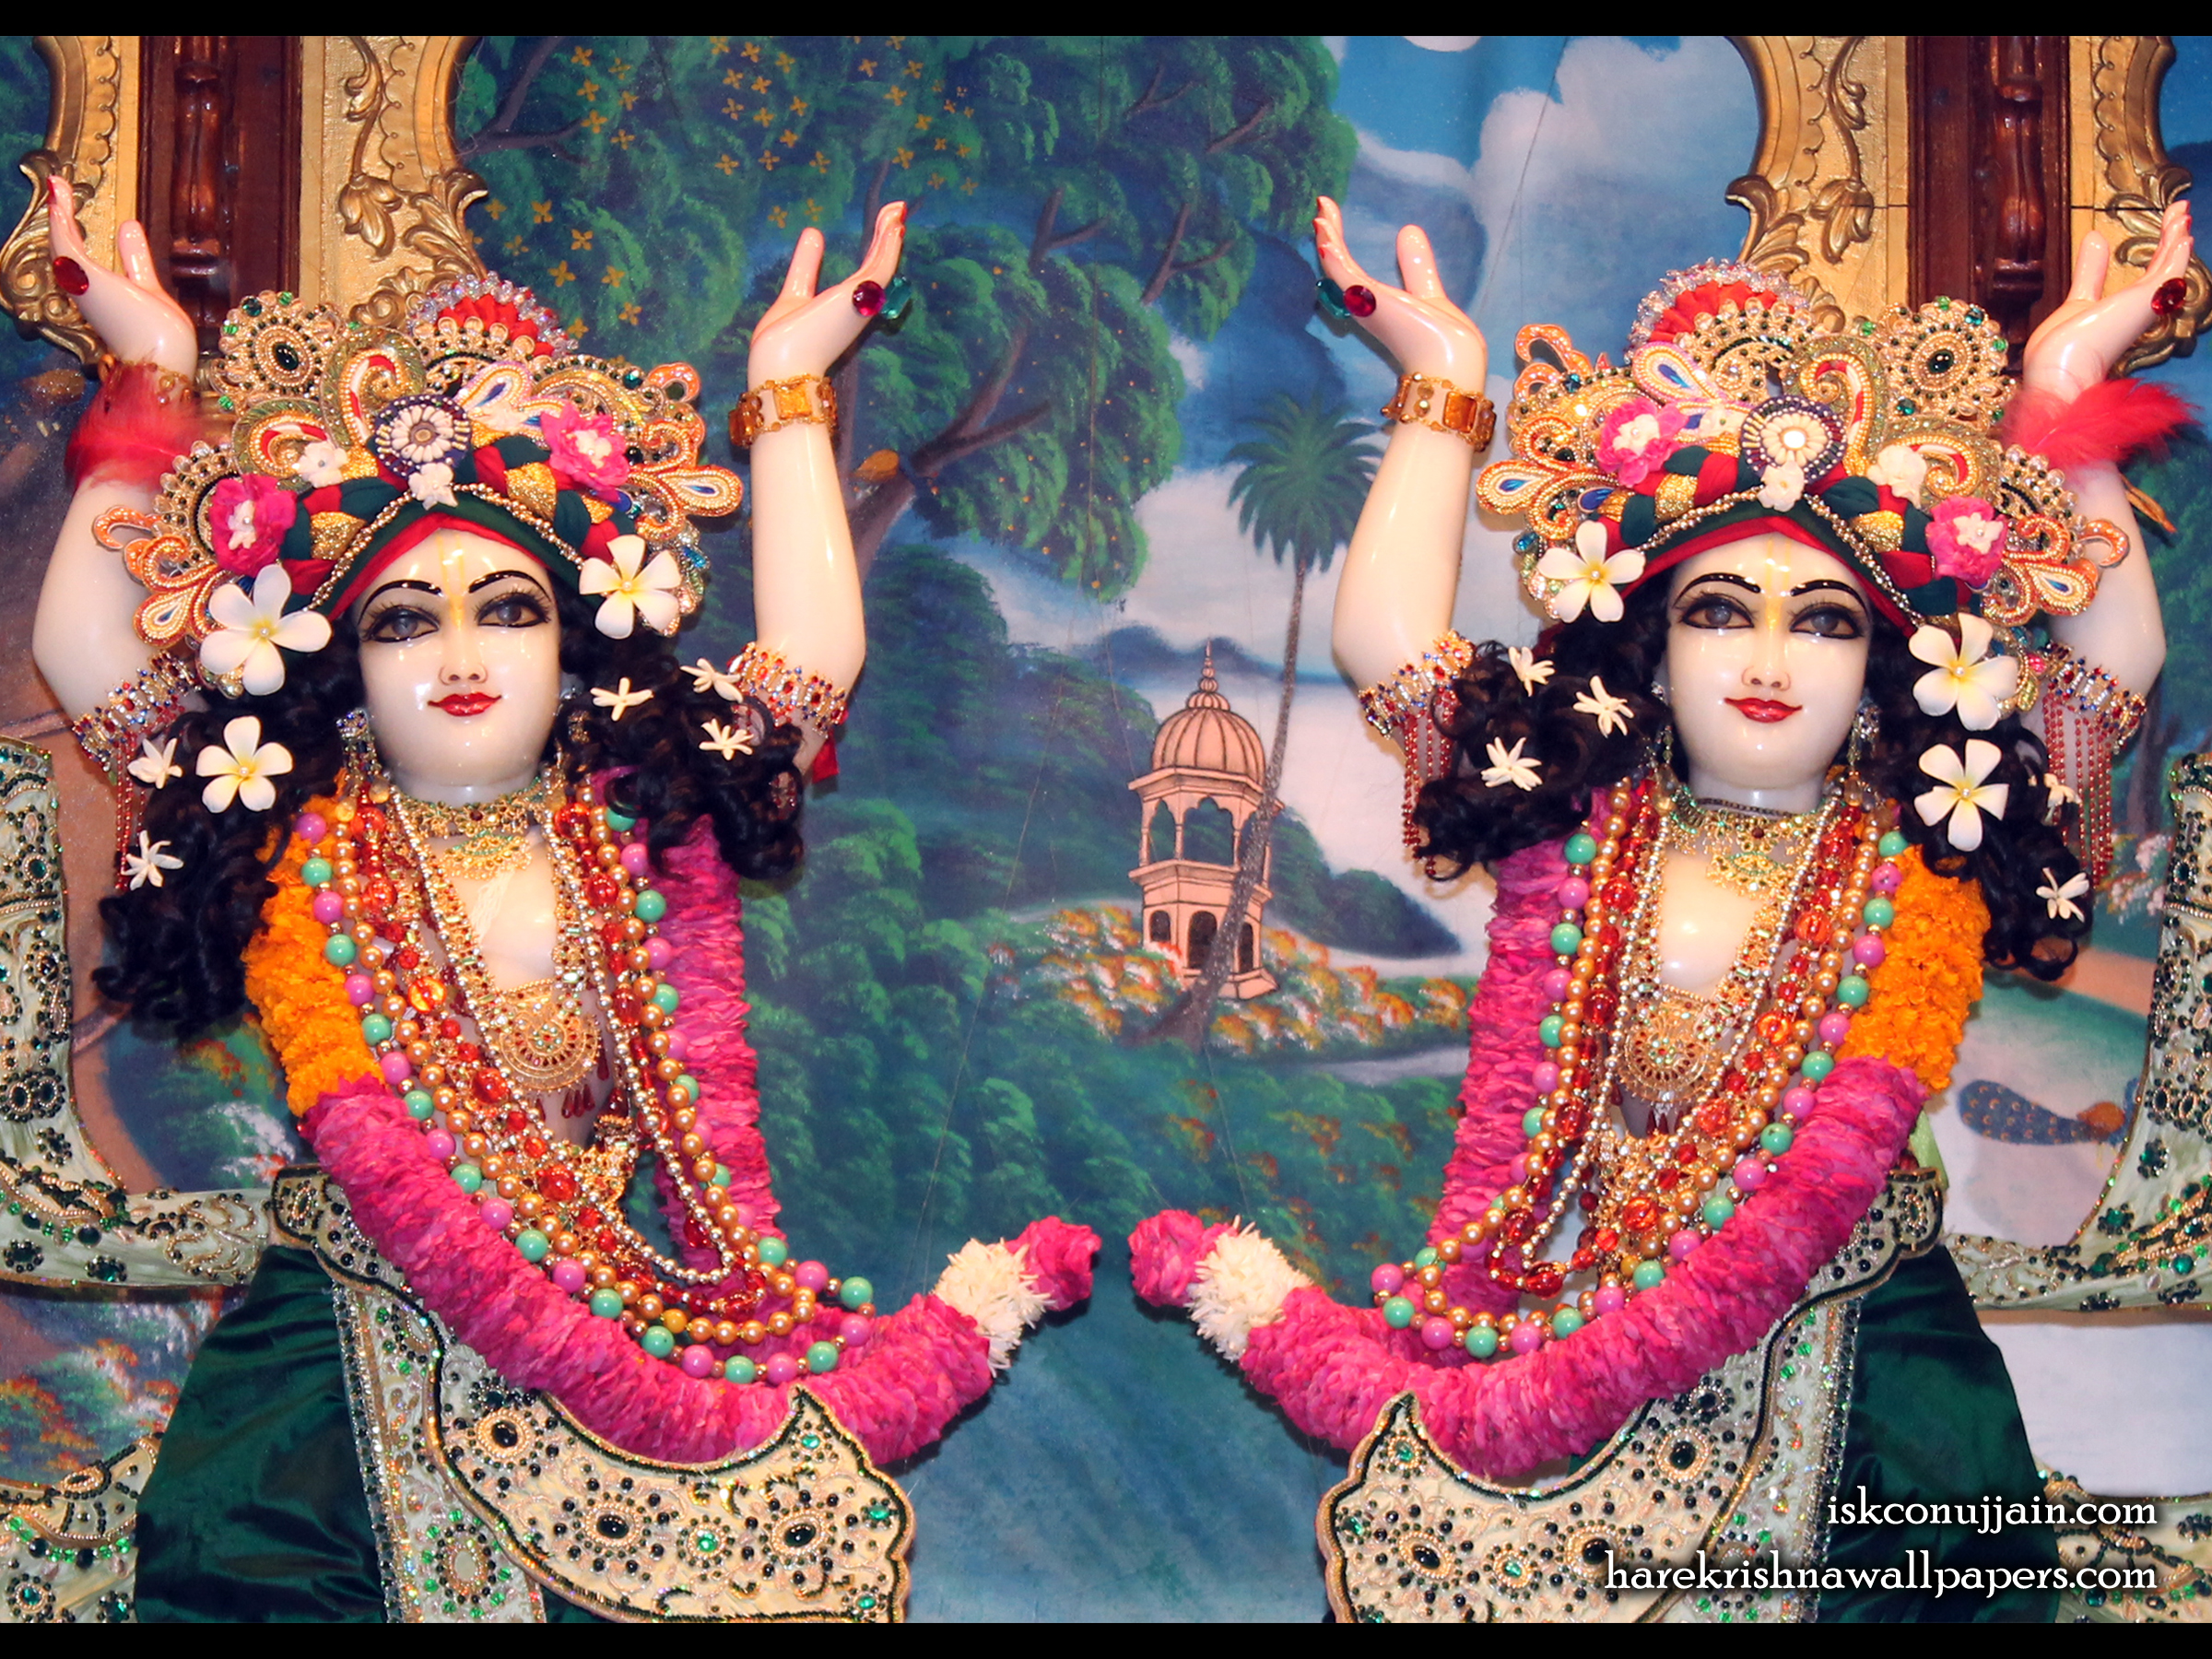 Sri Sri Gaura Nitai Close up Wallpaper (005) Size 2400x1800 Download